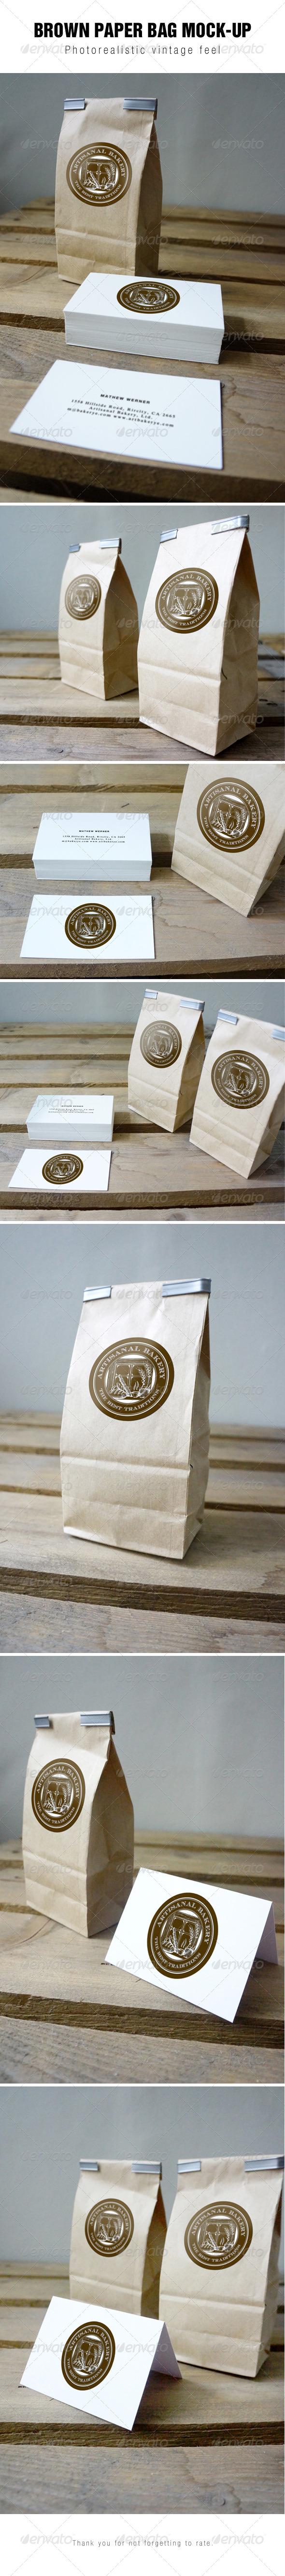 Brown Paper Bag Mockup - Packaging Product Mock-Ups